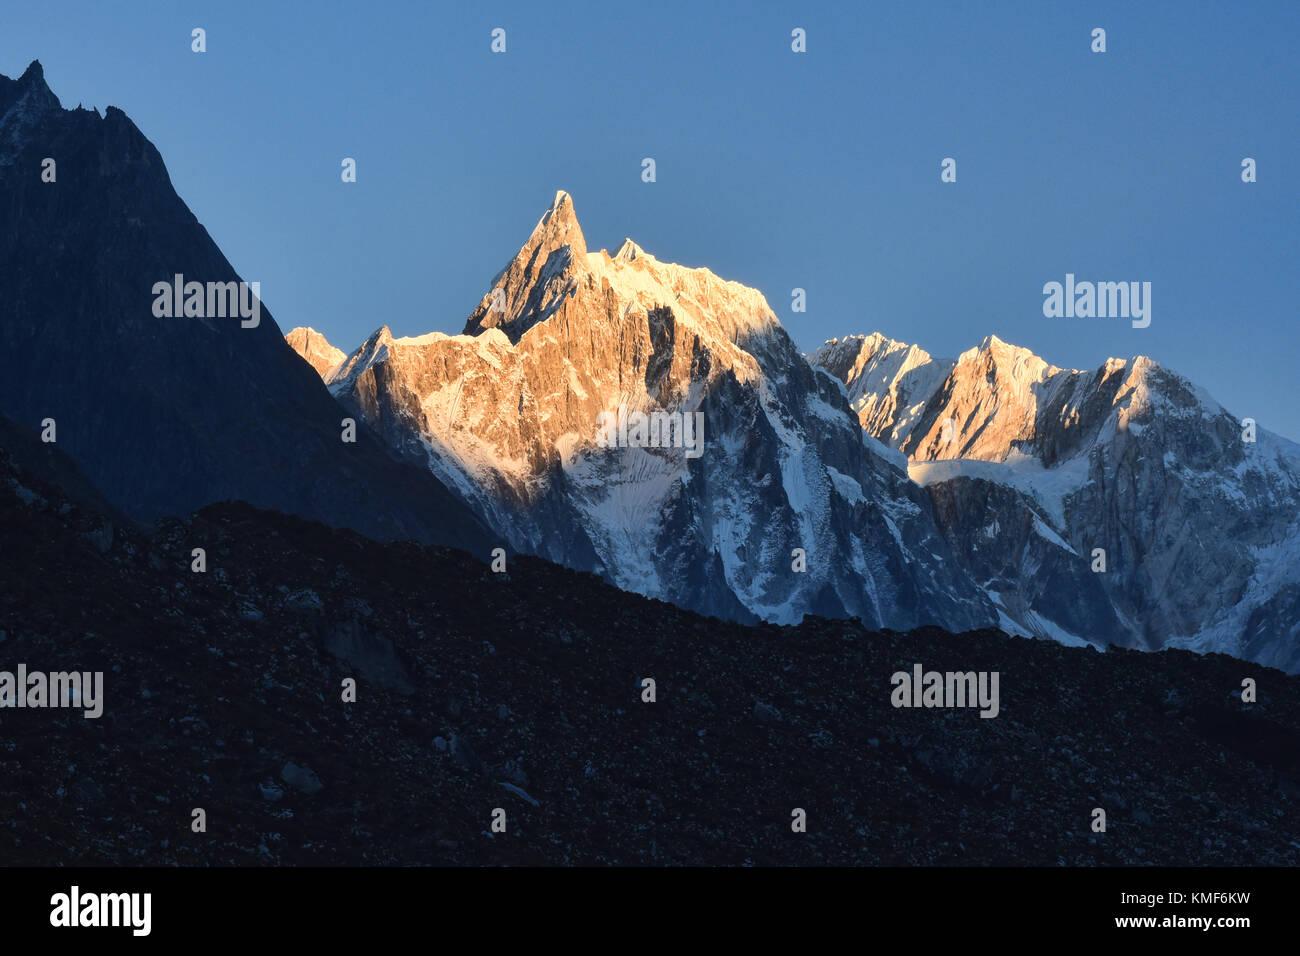 Kechakyu Himal at sunrise, Bimthang, Nepal - Stock Image